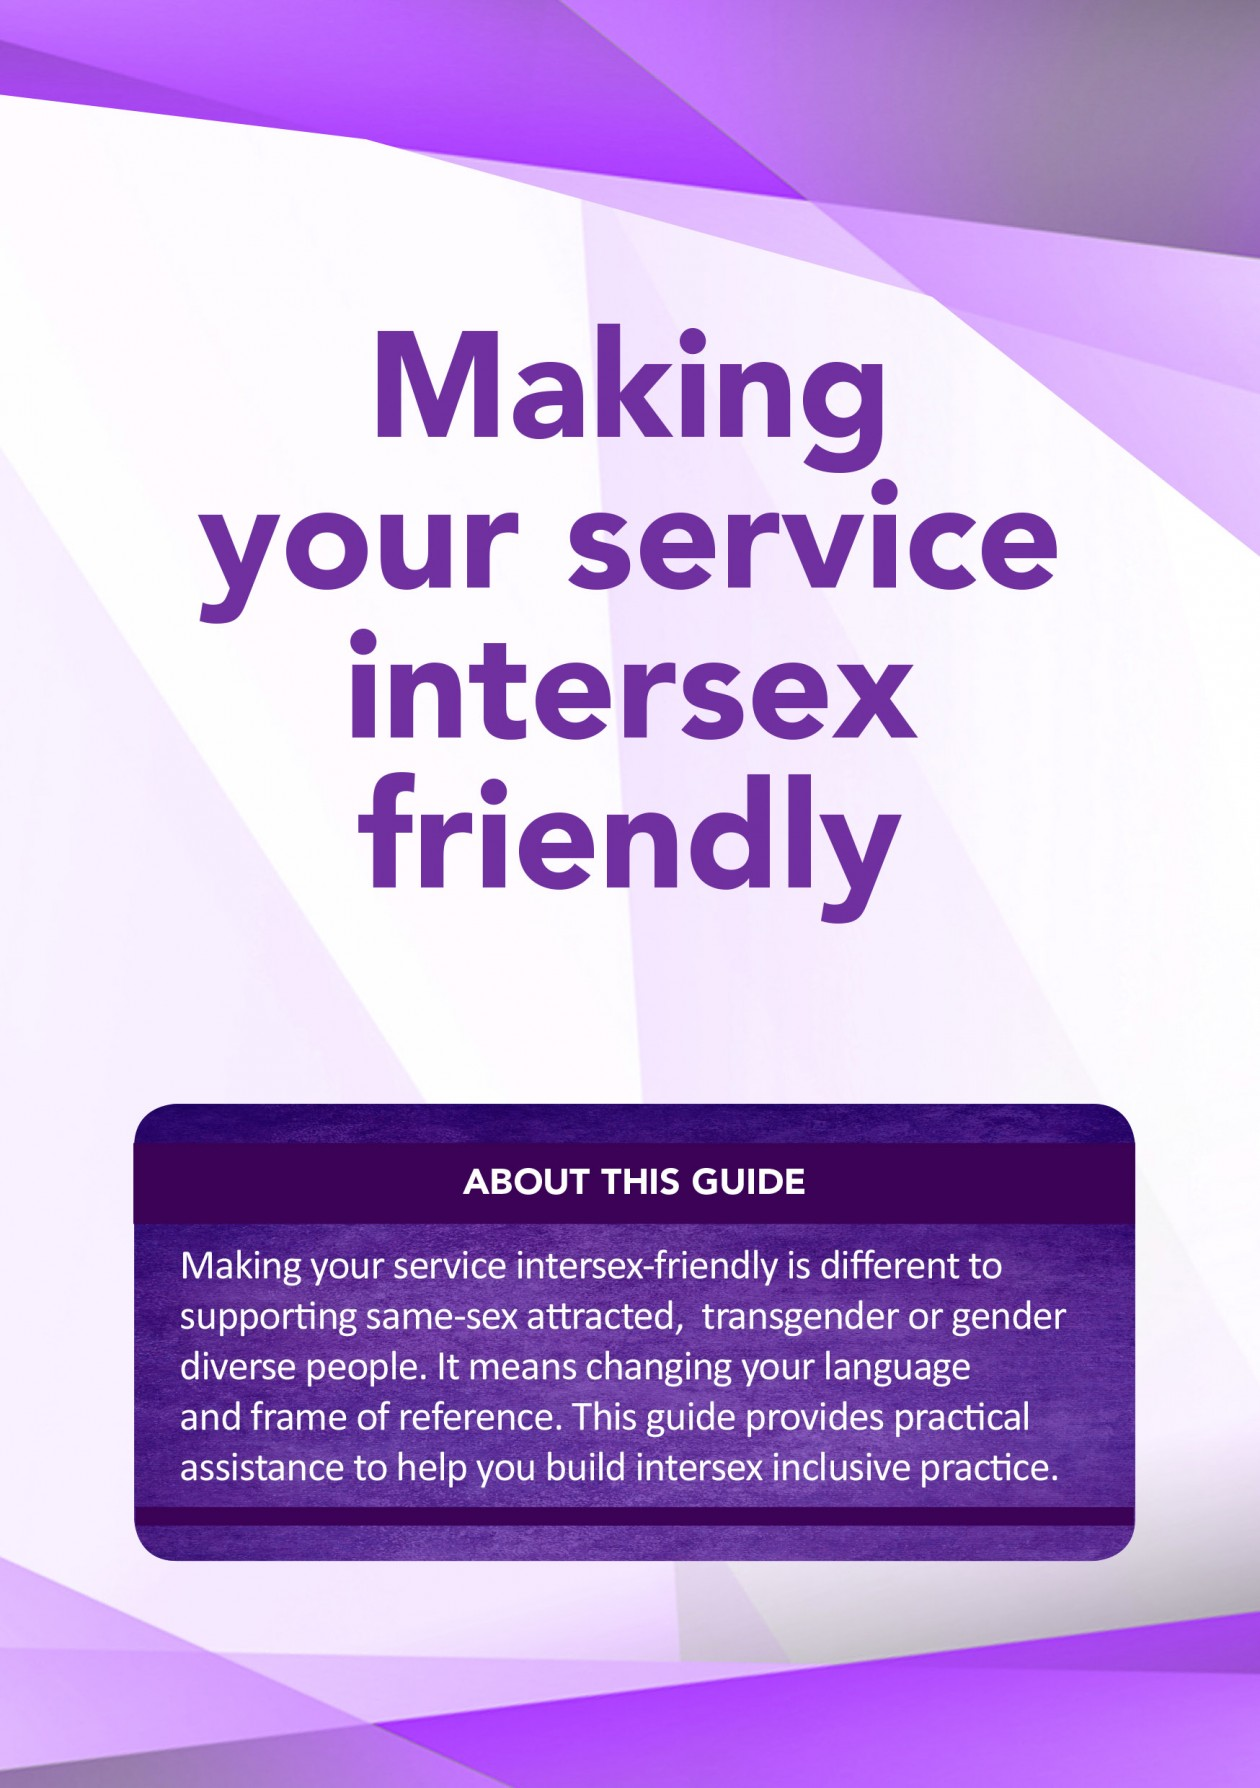 OII-Australia-Inclusive-Service-1